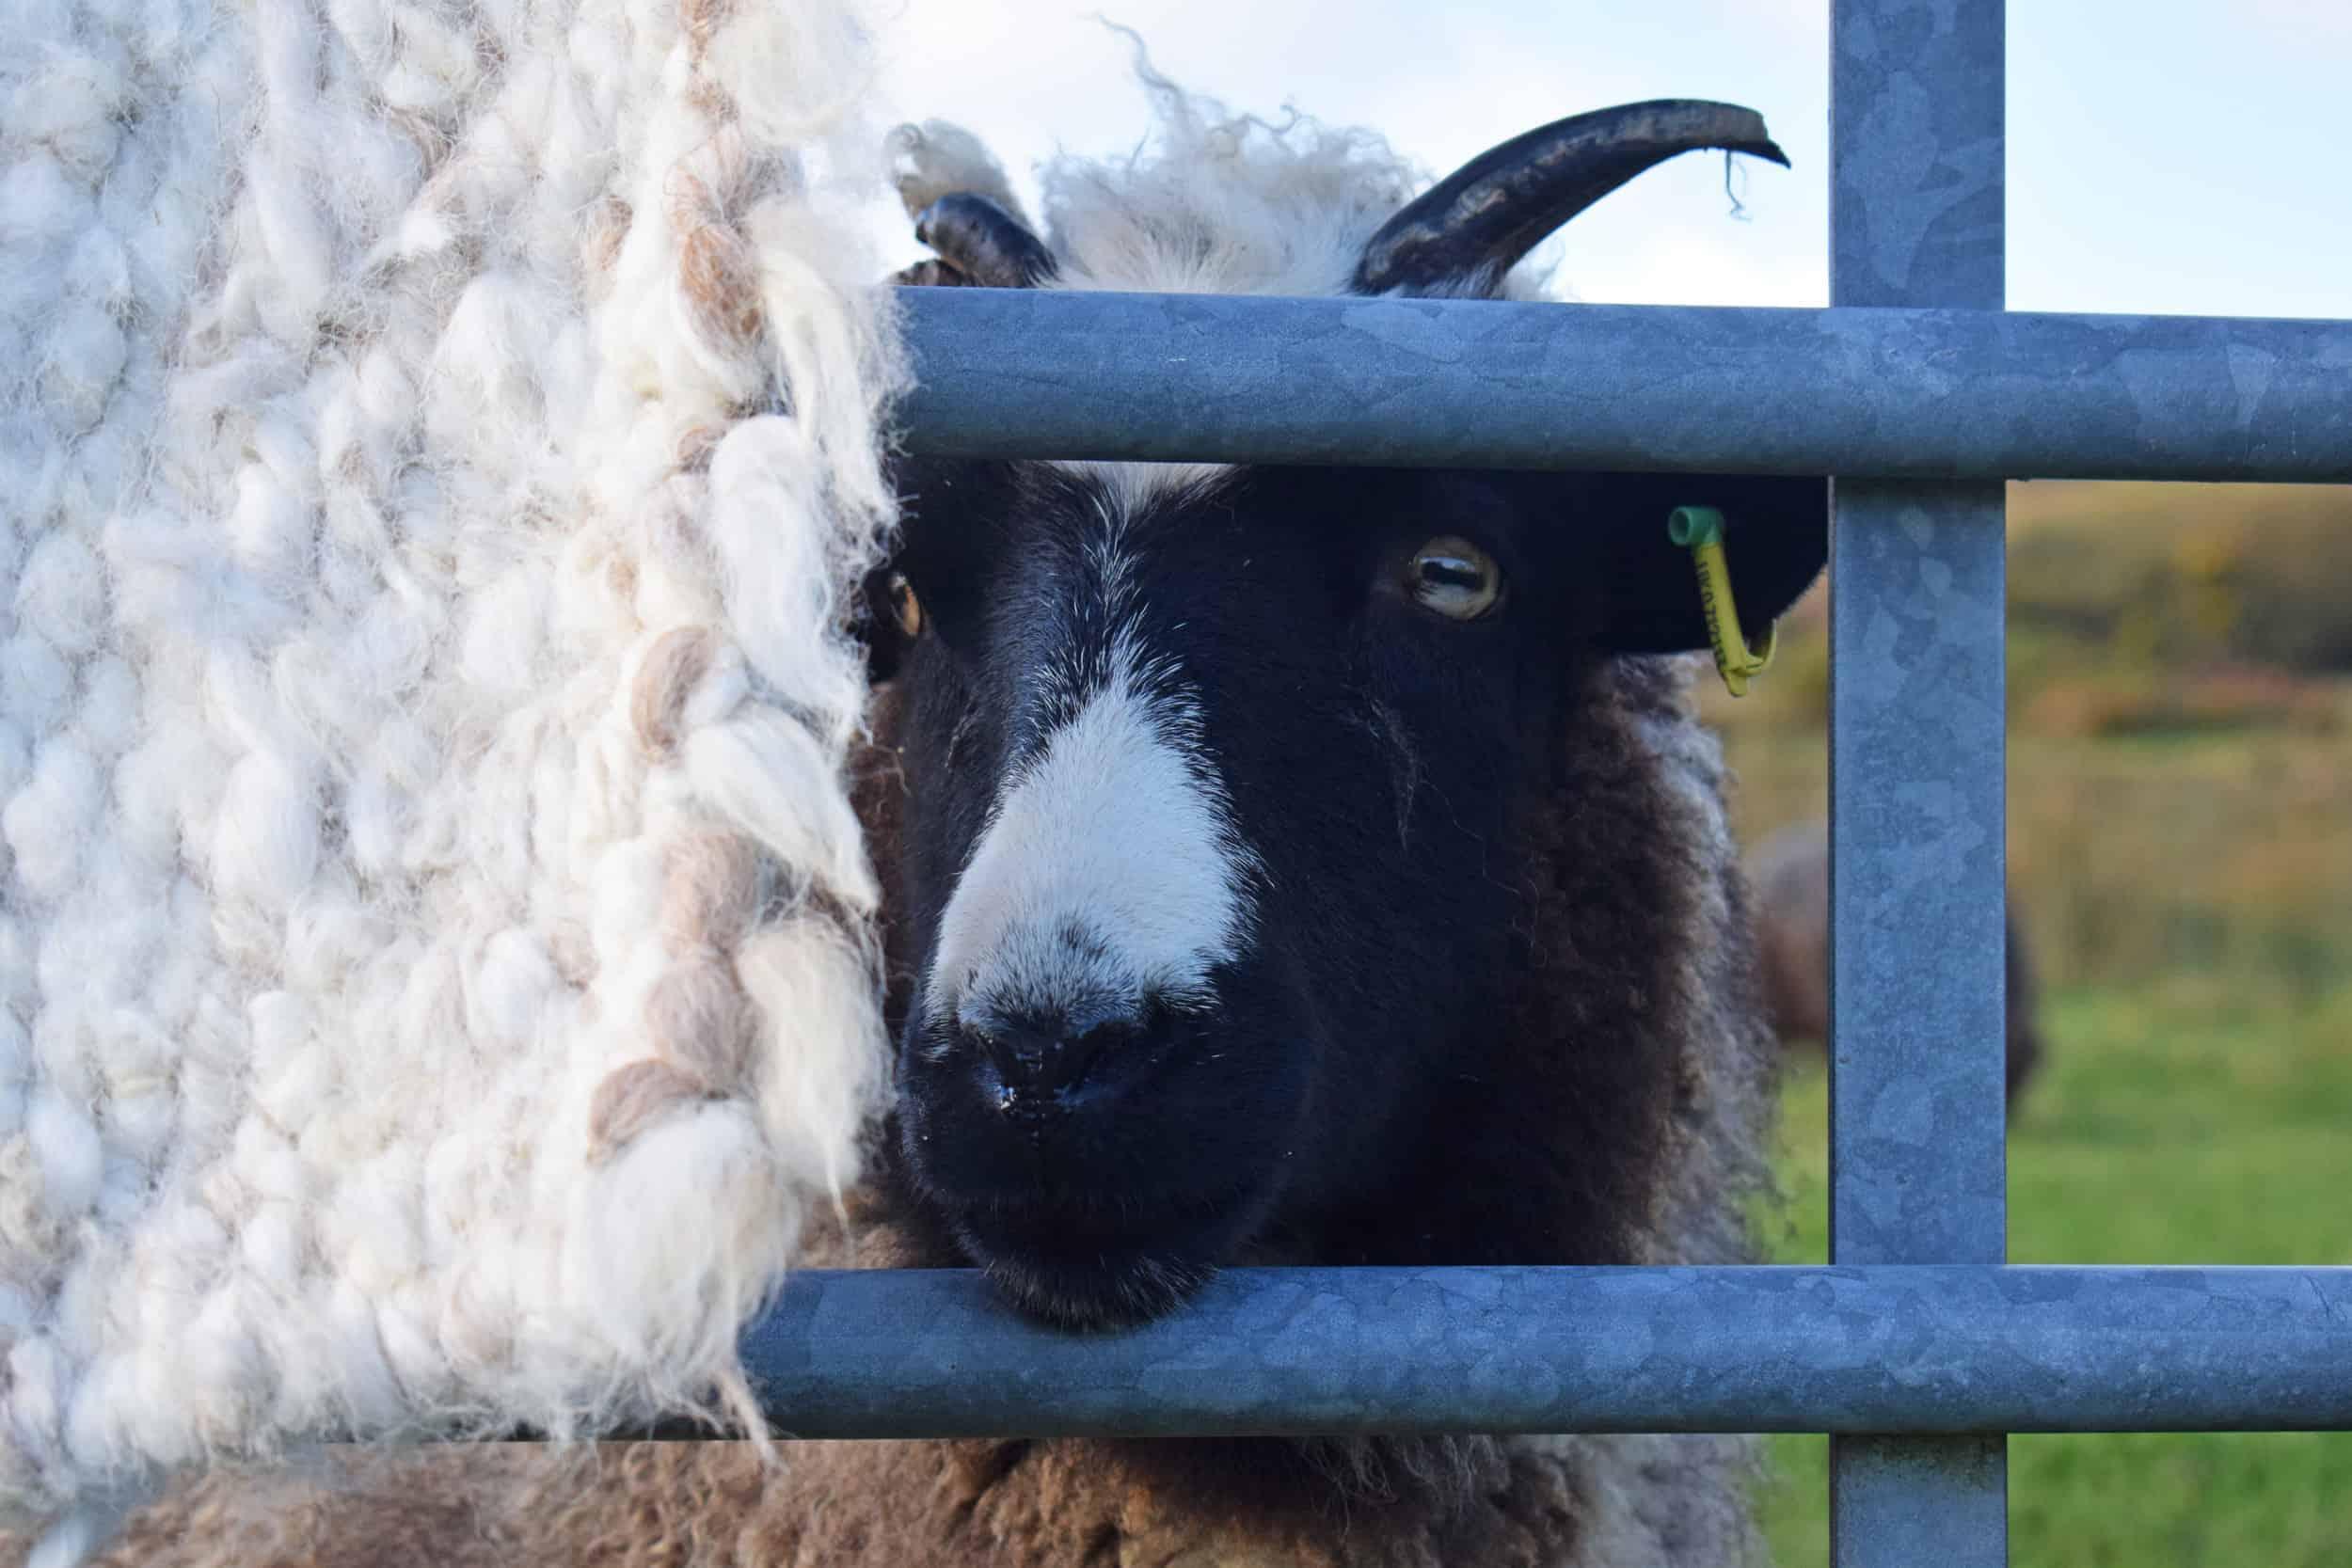 Holly pegloom pet lamb sheep jacob cross shetland spotted black grey white wales gwynedd british wool gifts homeware